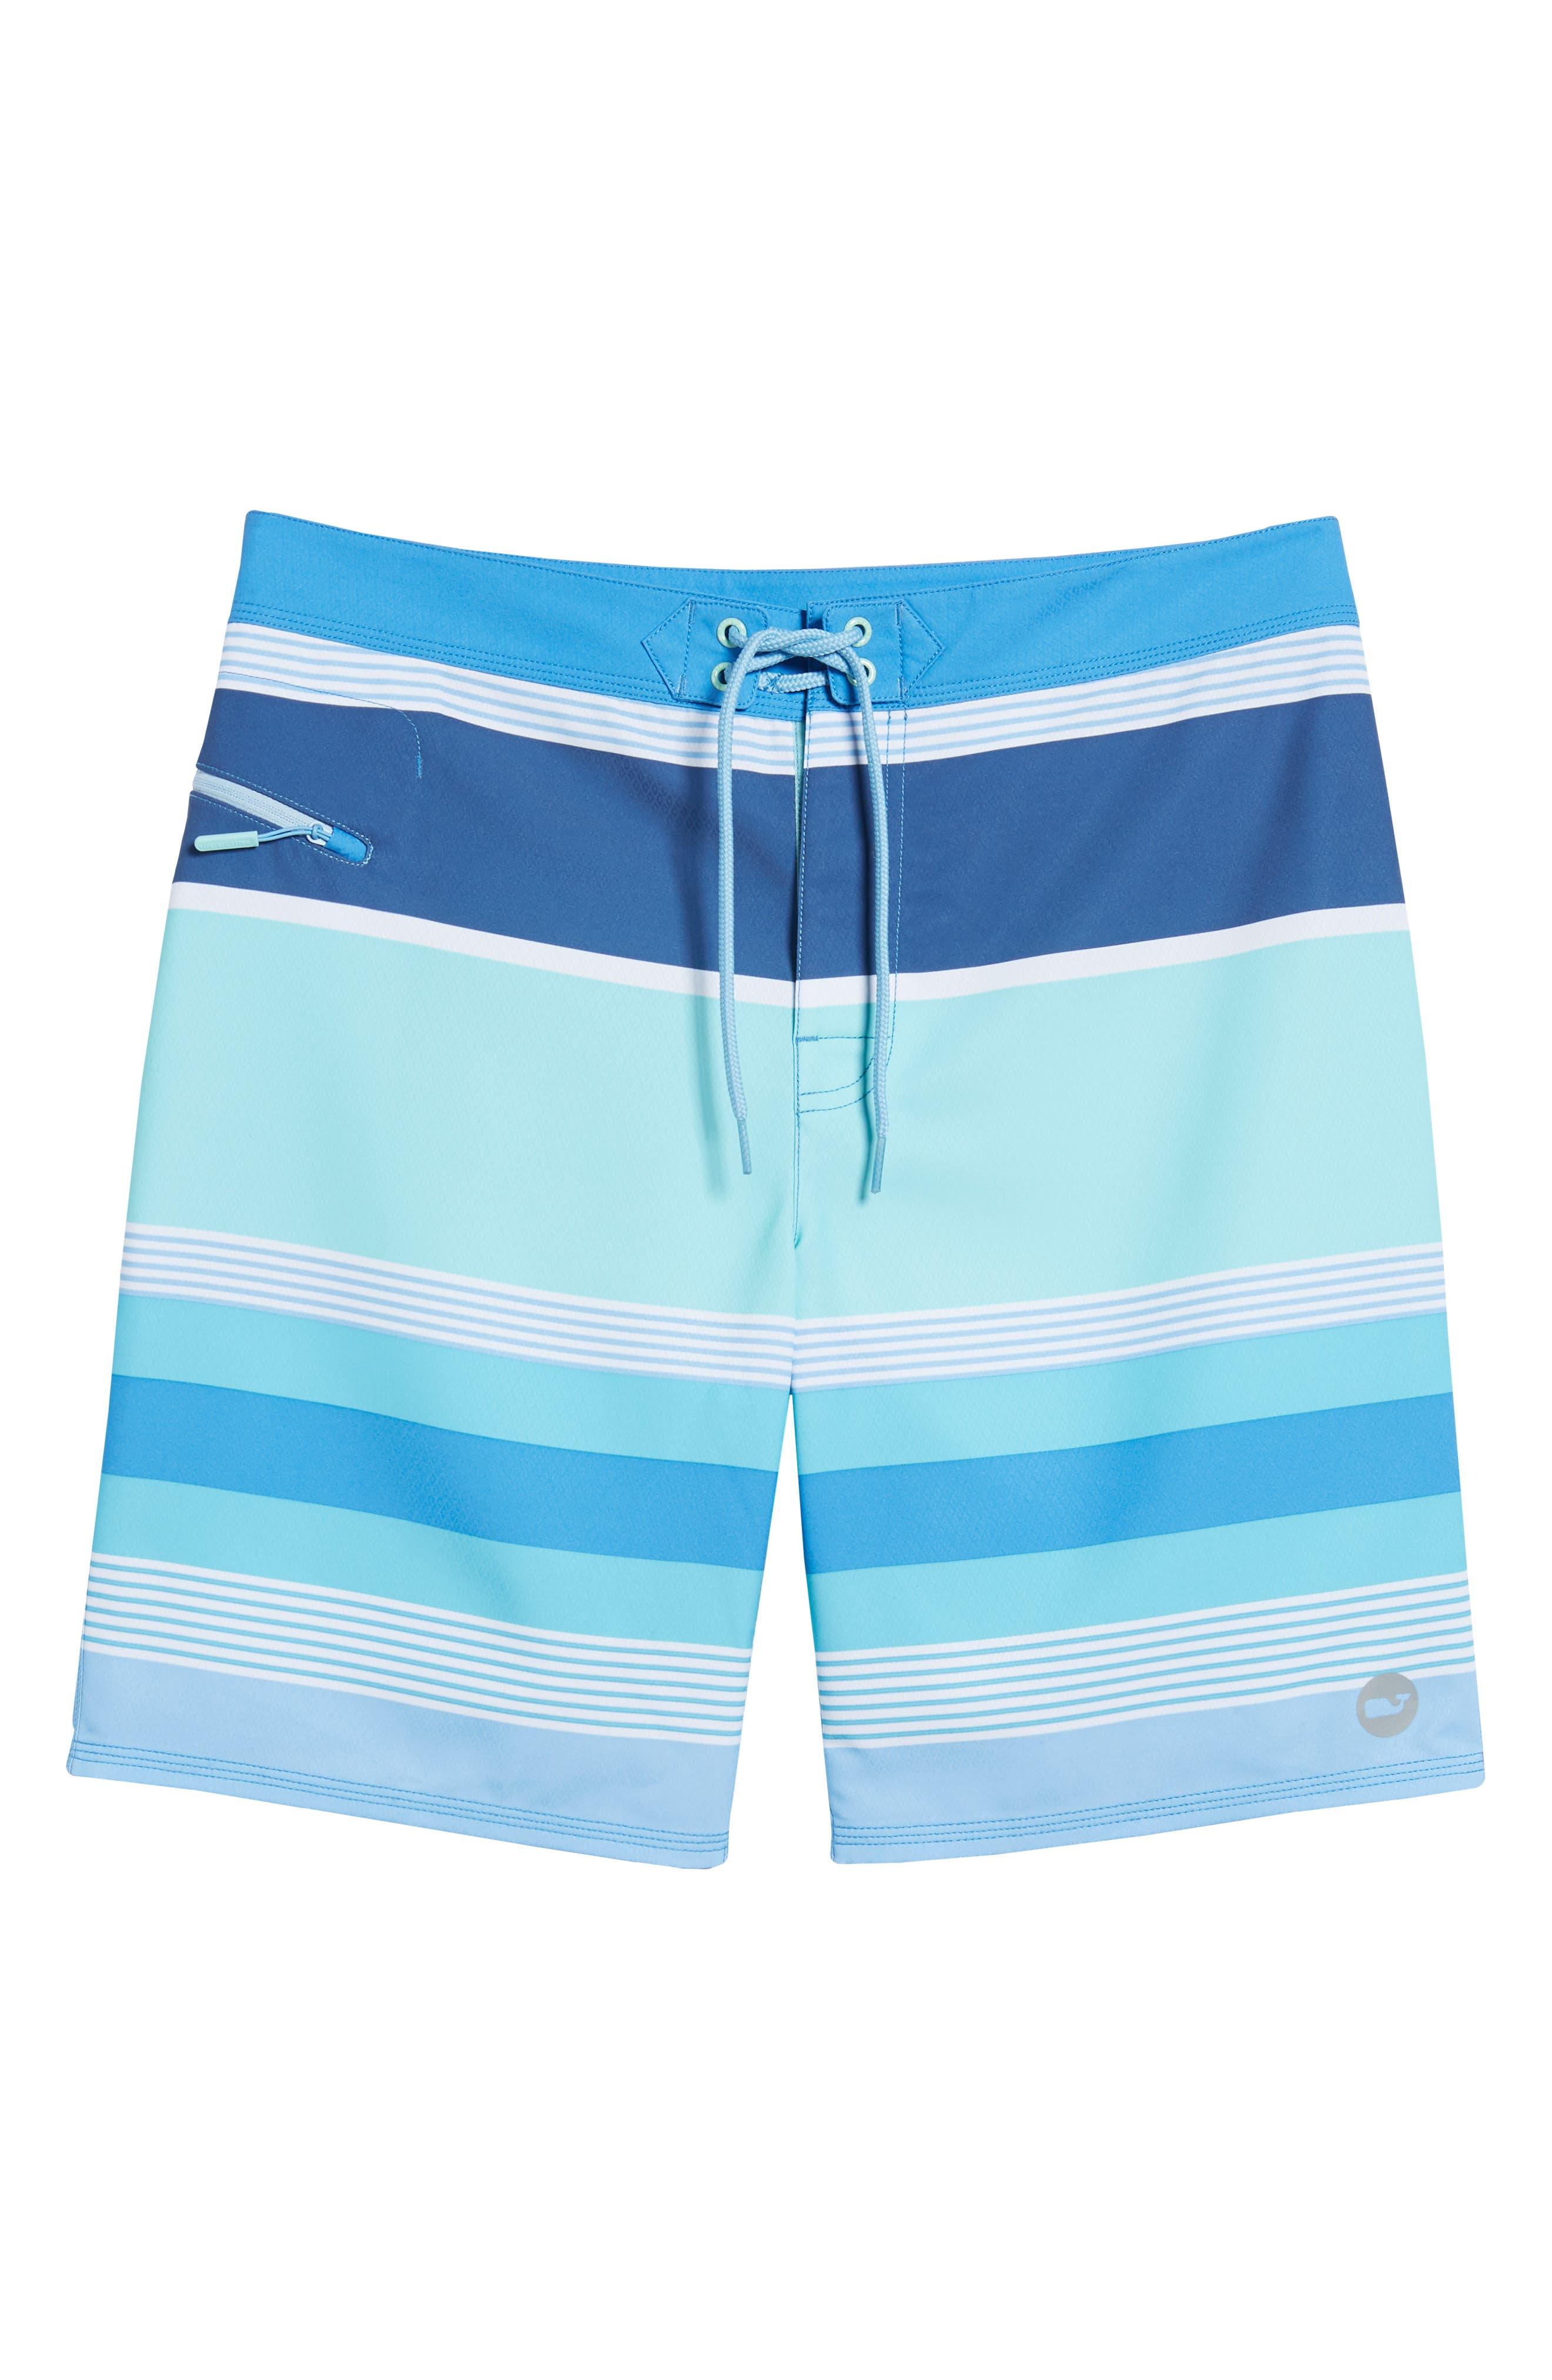 Peaks Island Board Shorts,                             Alternate thumbnail 6, color,                             437